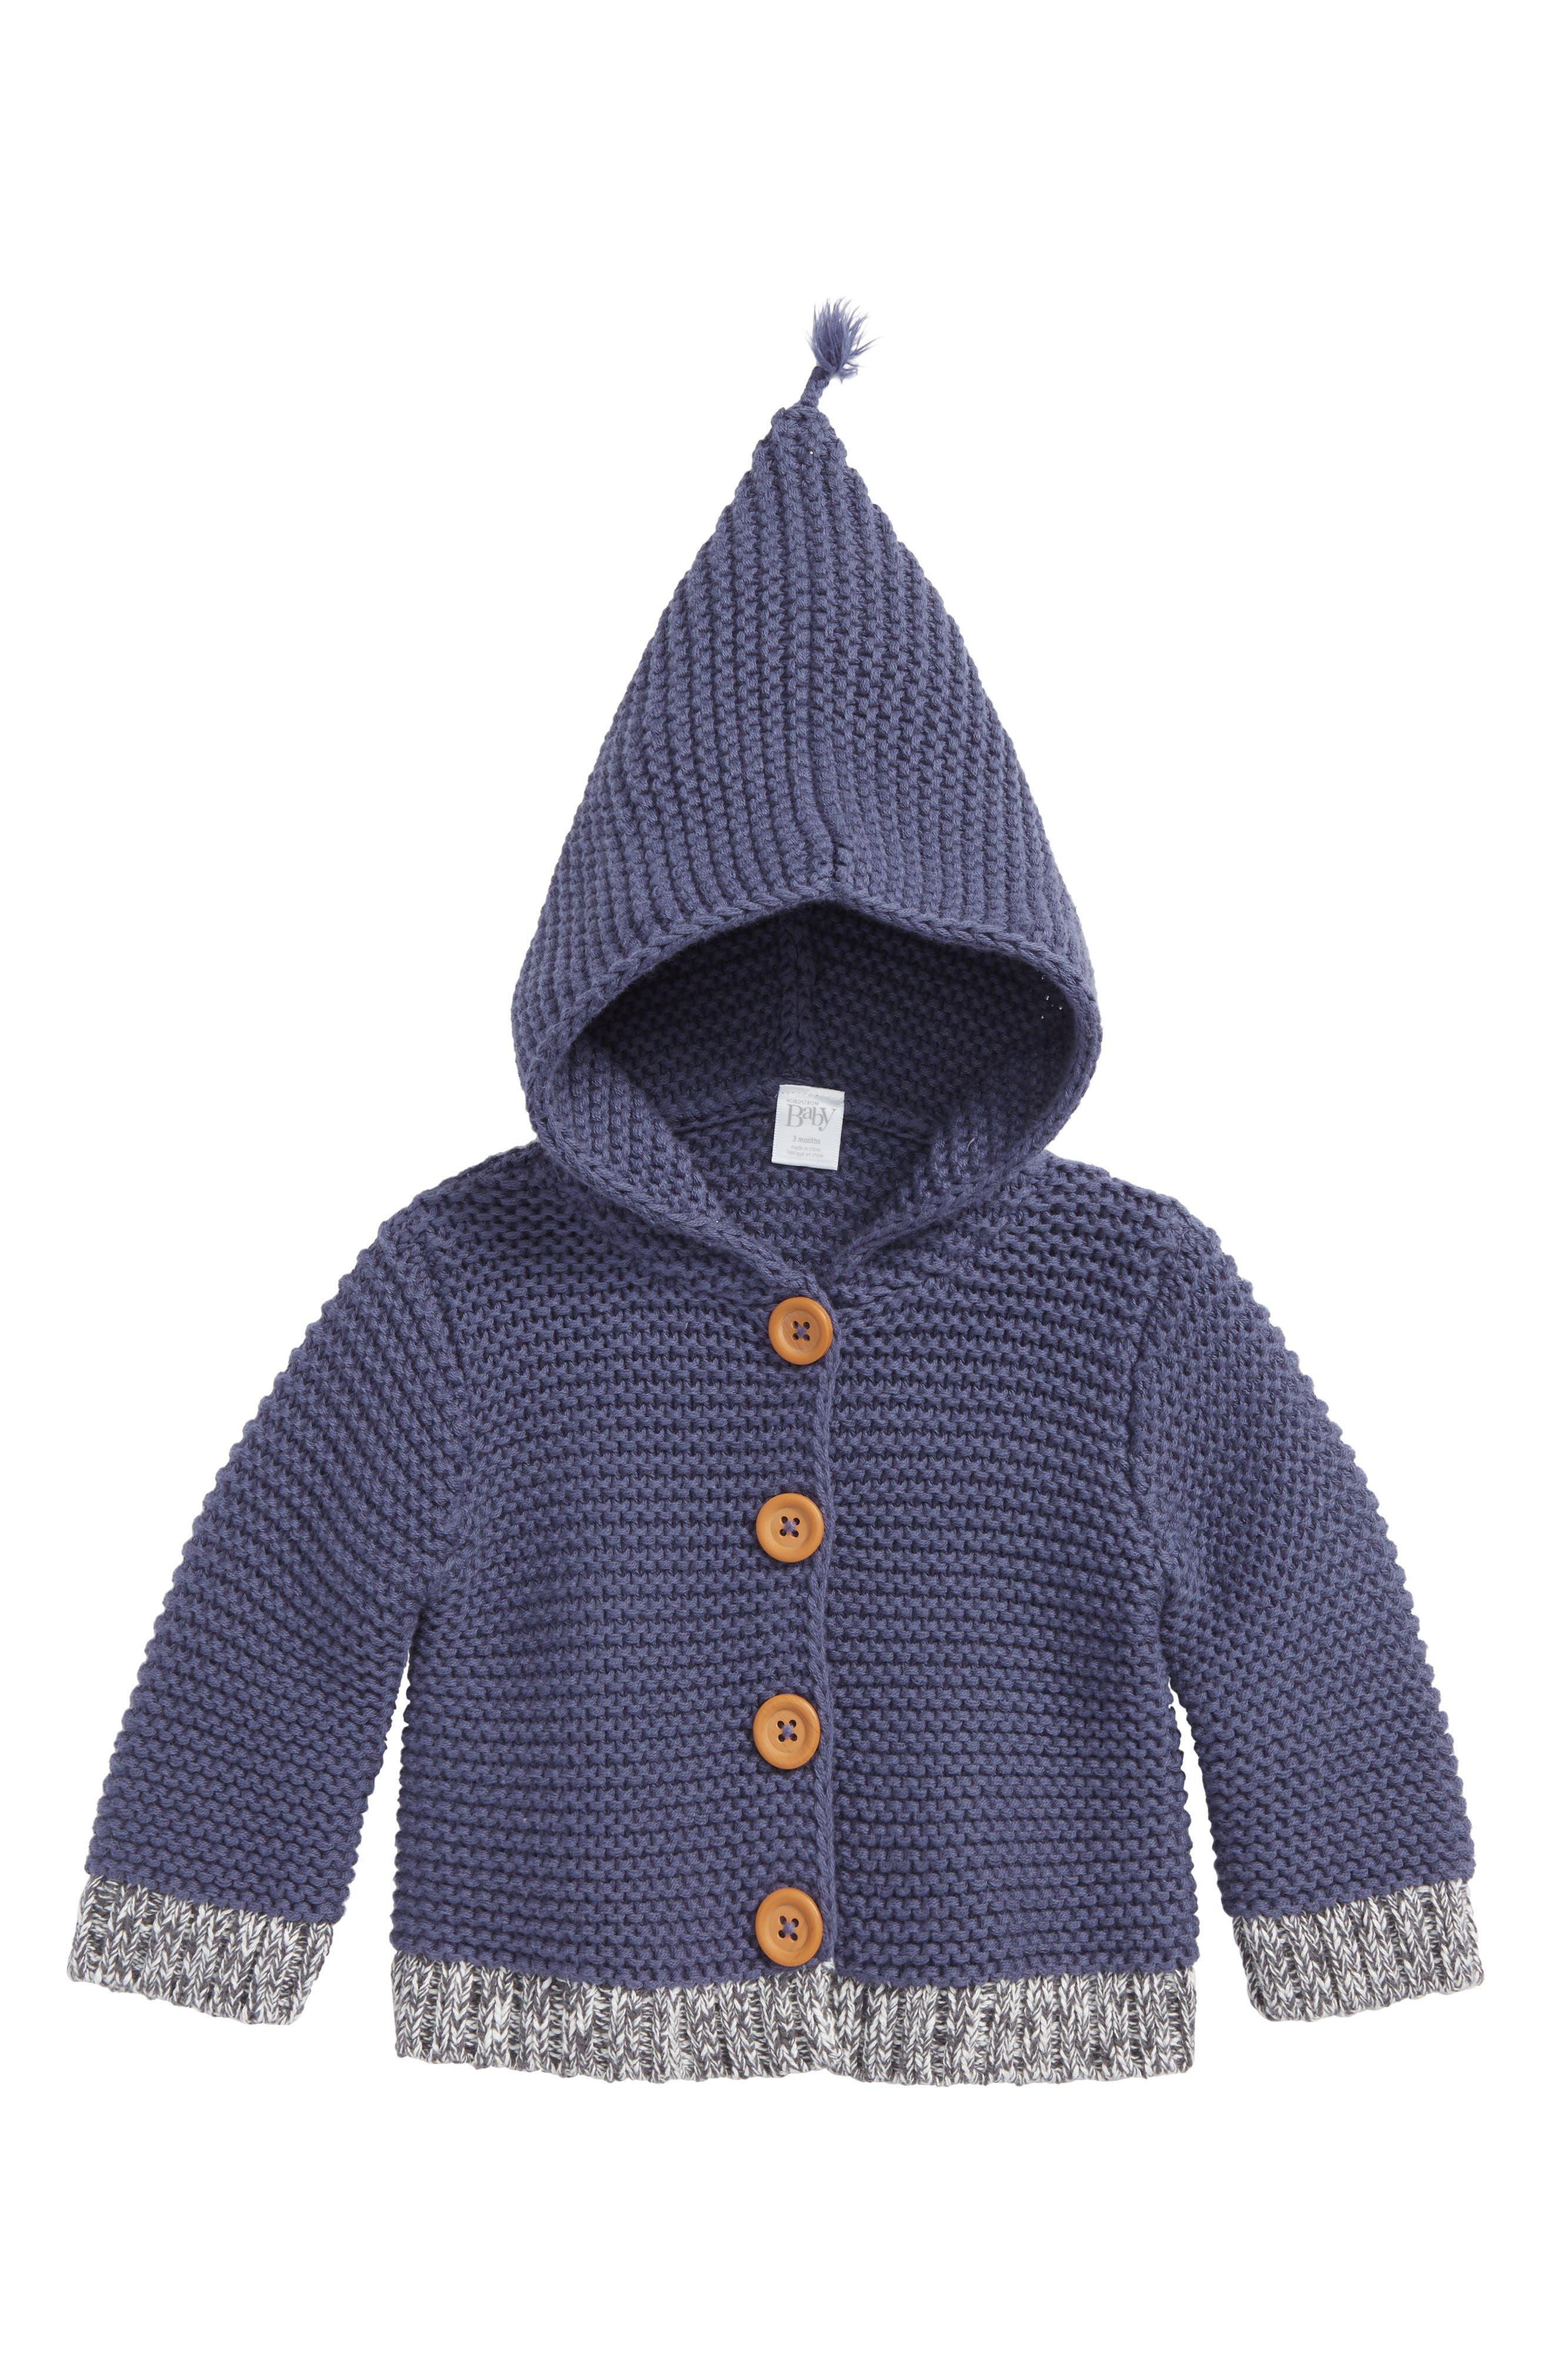 Organic Cotton Hooded Cardigan,                             Main thumbnail 1, color,                             NAVY CROWN